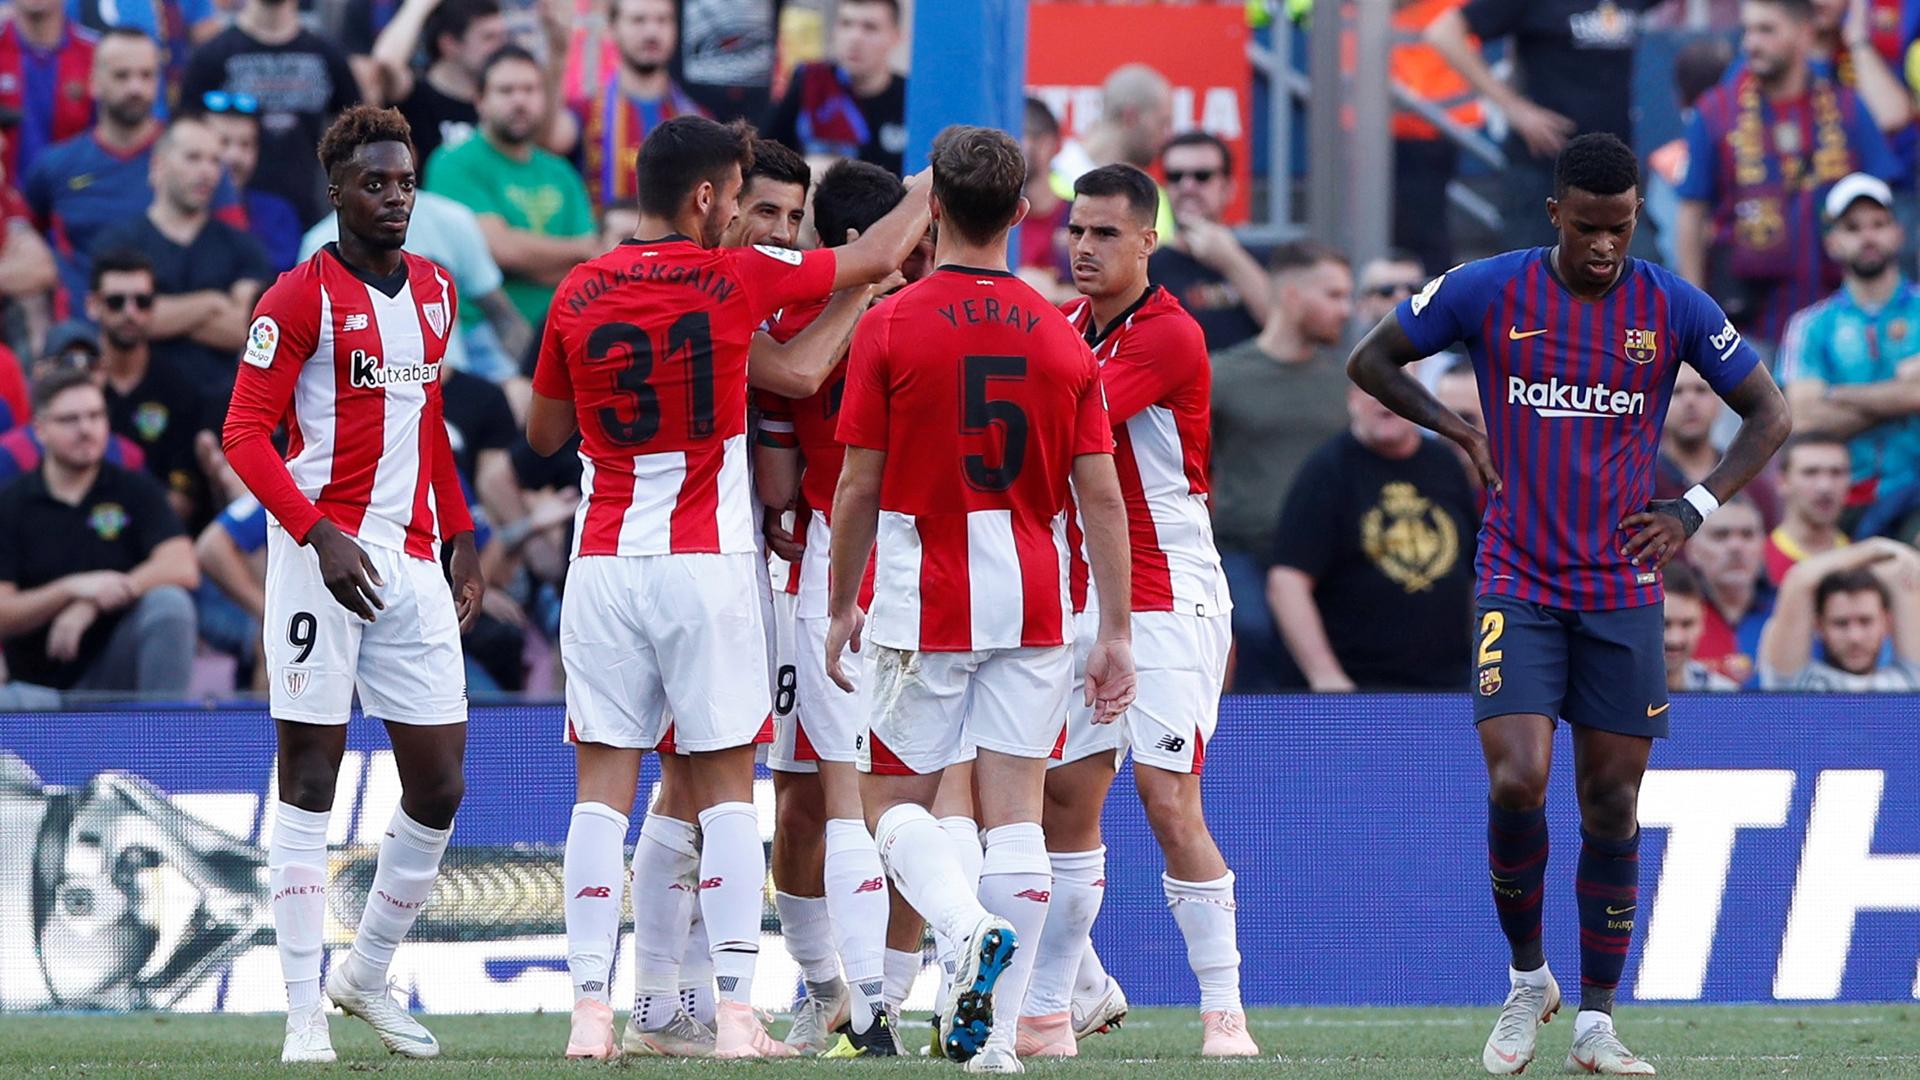 a415dd88f245c Messi le cambió la cara a un Barcelona que apenas empató con Athletic Bilbao  - Infobae